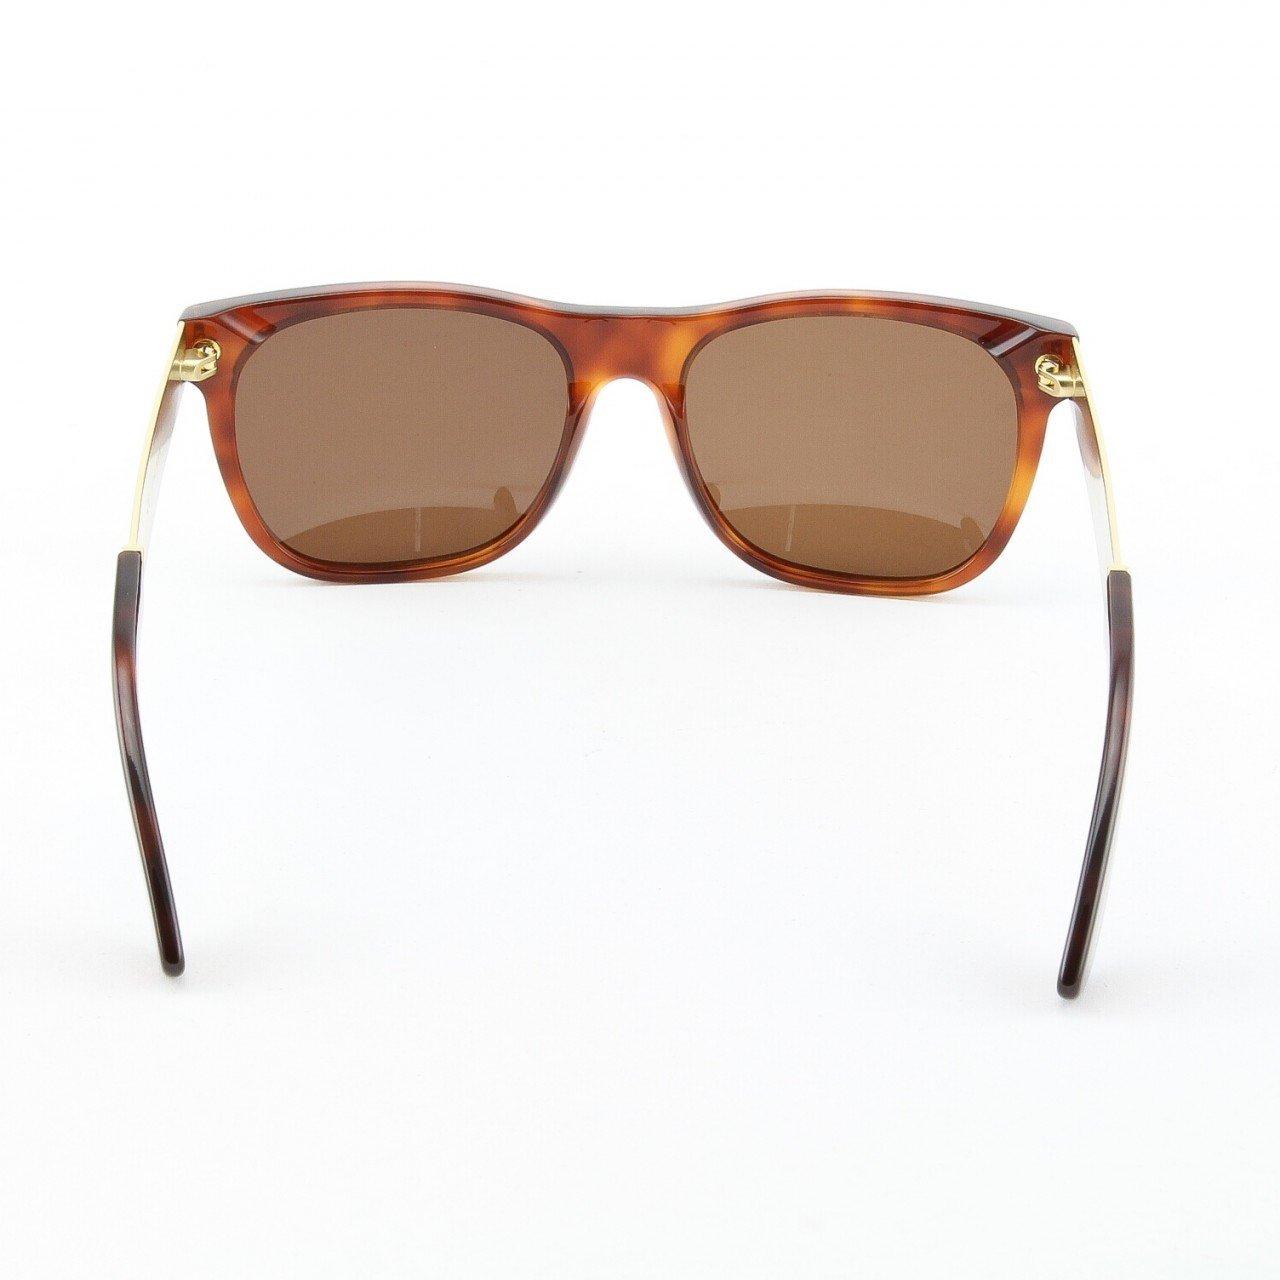 Retro Super Future 364 364 Classic Havana//Y Gold Basic Wayfarer Sunglasses